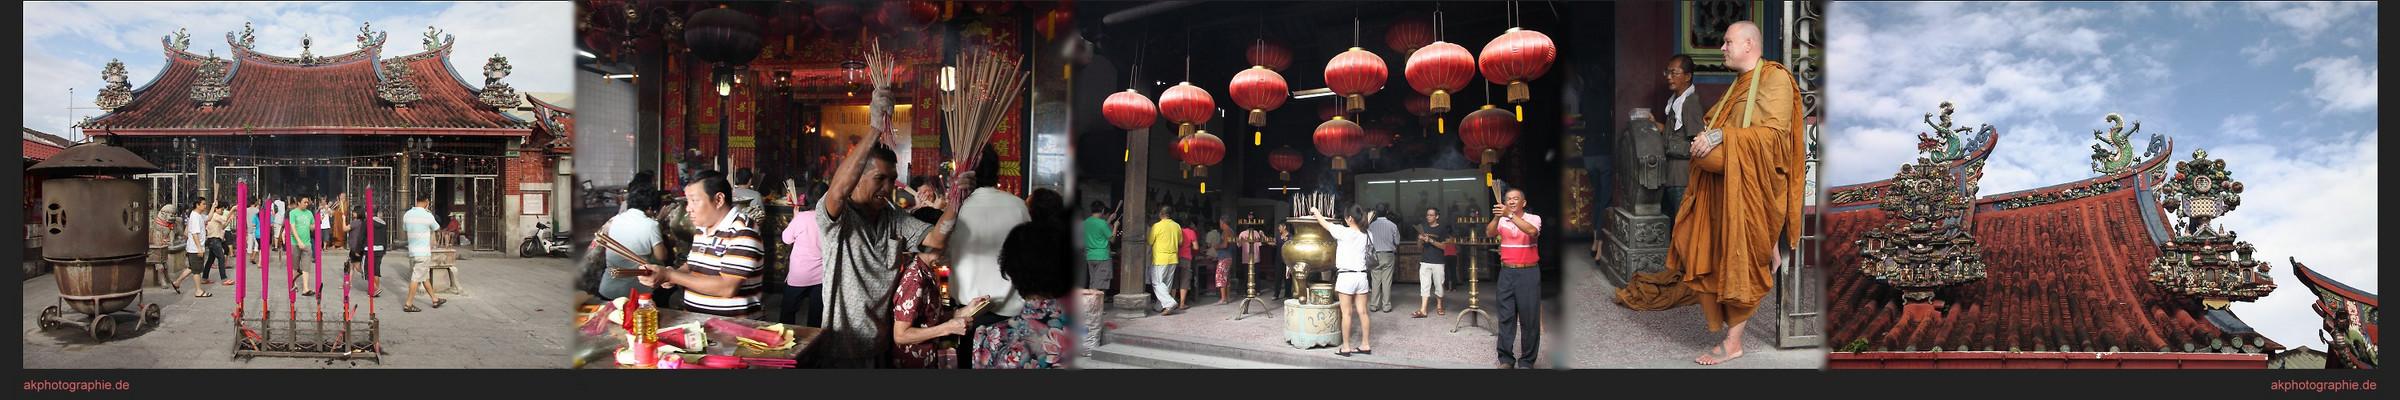 Kuan Yin Temple - Georgetown (Penang)